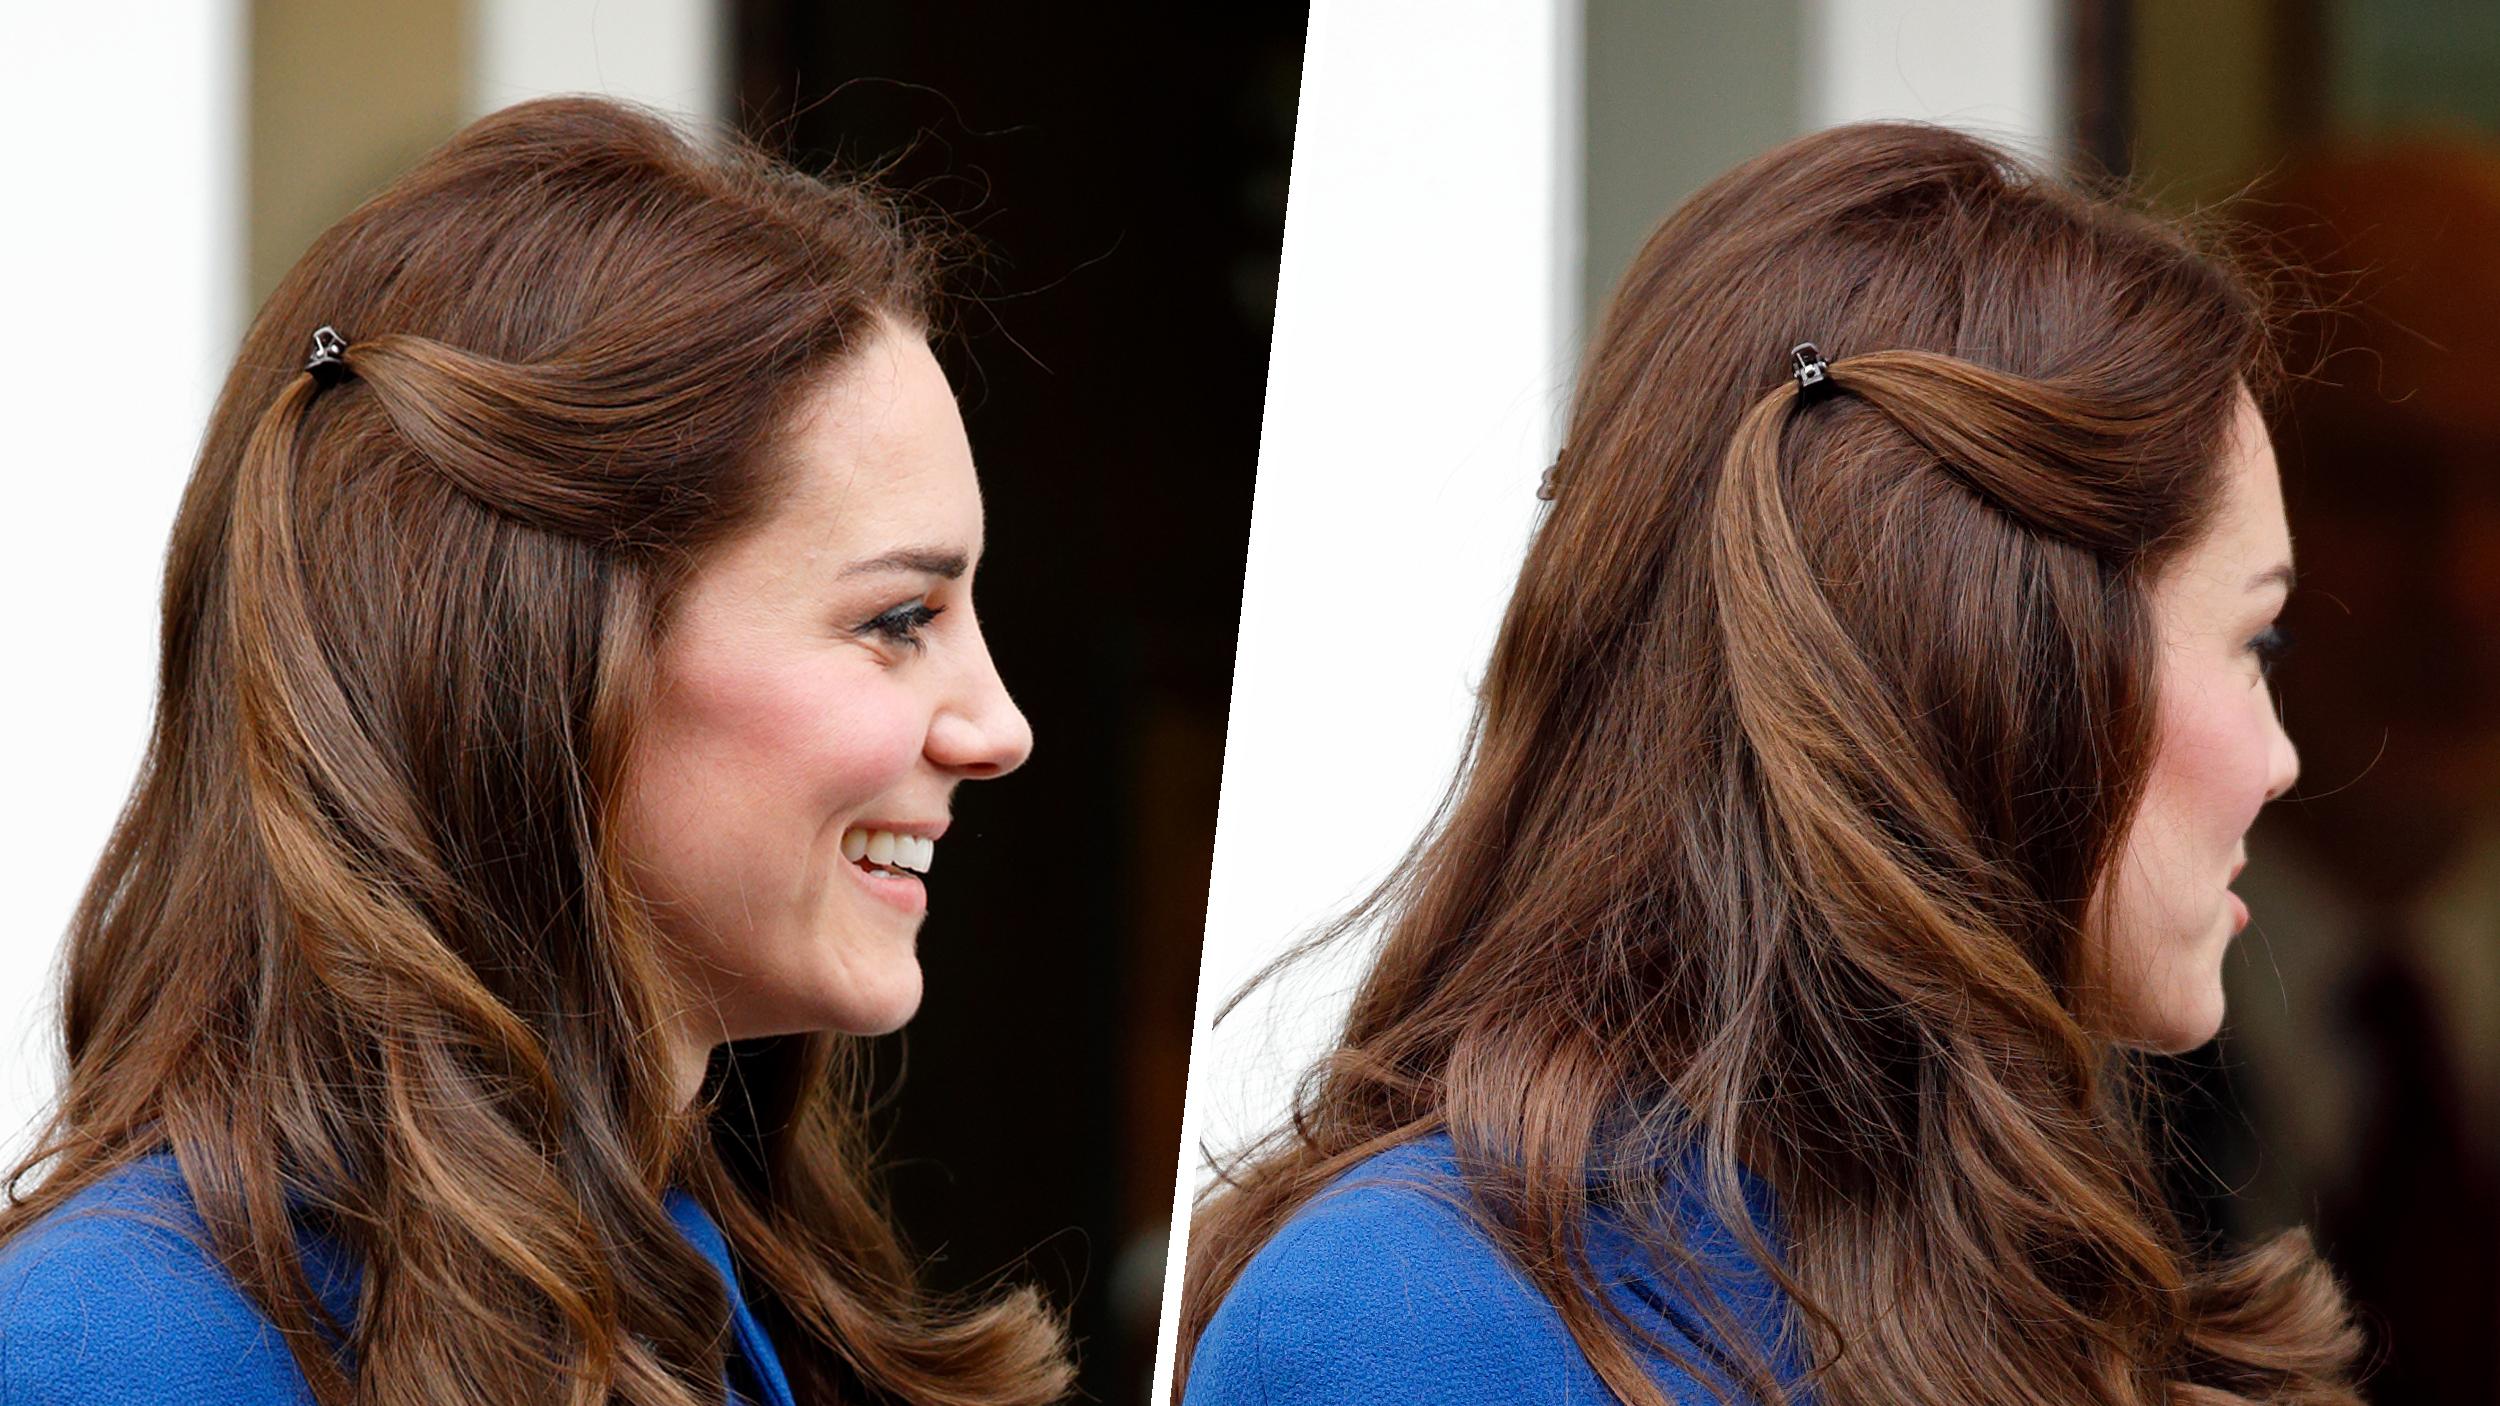 Duchess Kate wears plastic hair clips like a regular human